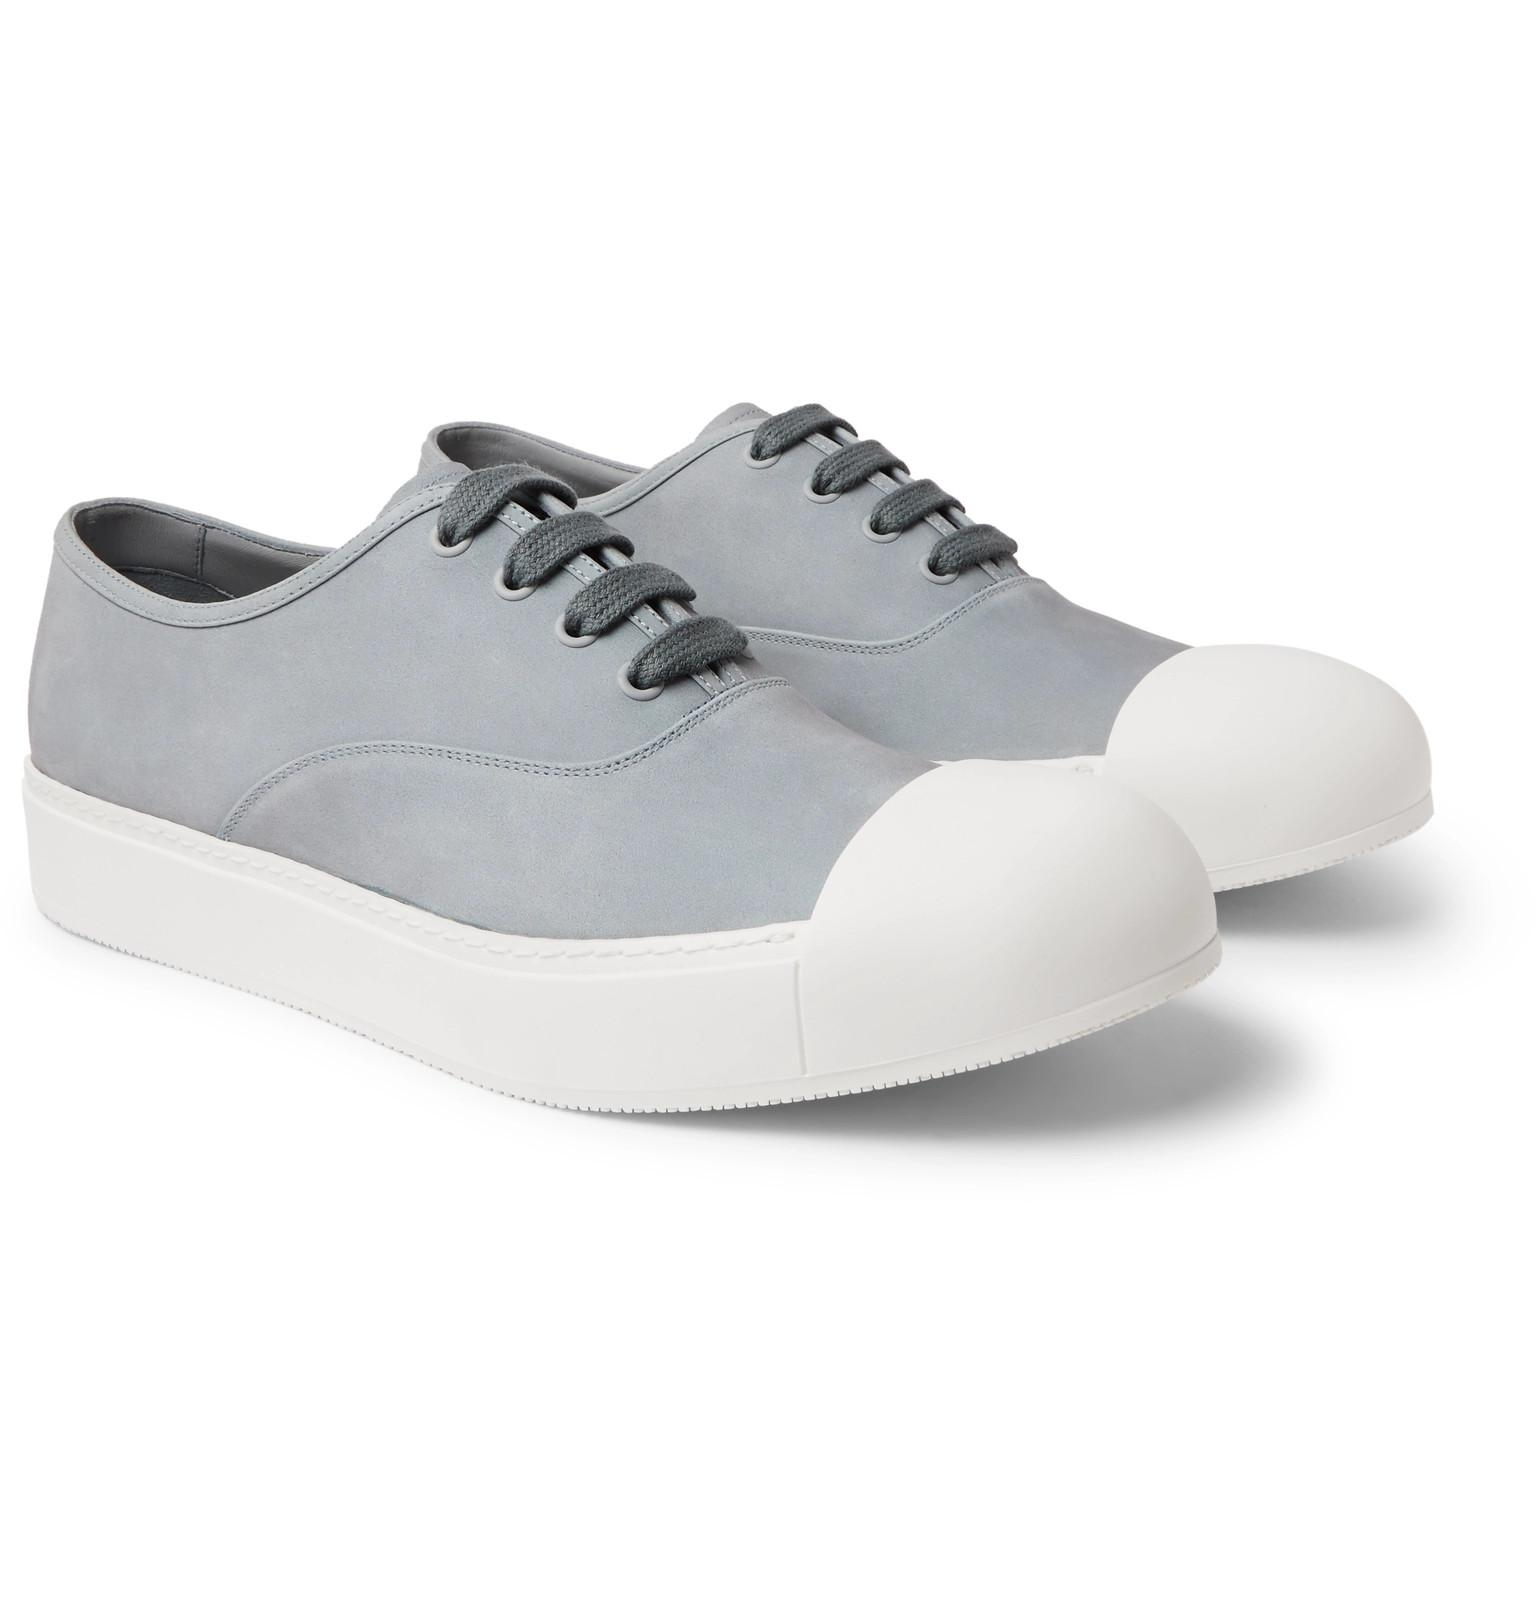 cheap price low shipping fee Prada Cap-Toe Nubuck Sneakers discount 2014 QKXapsrL